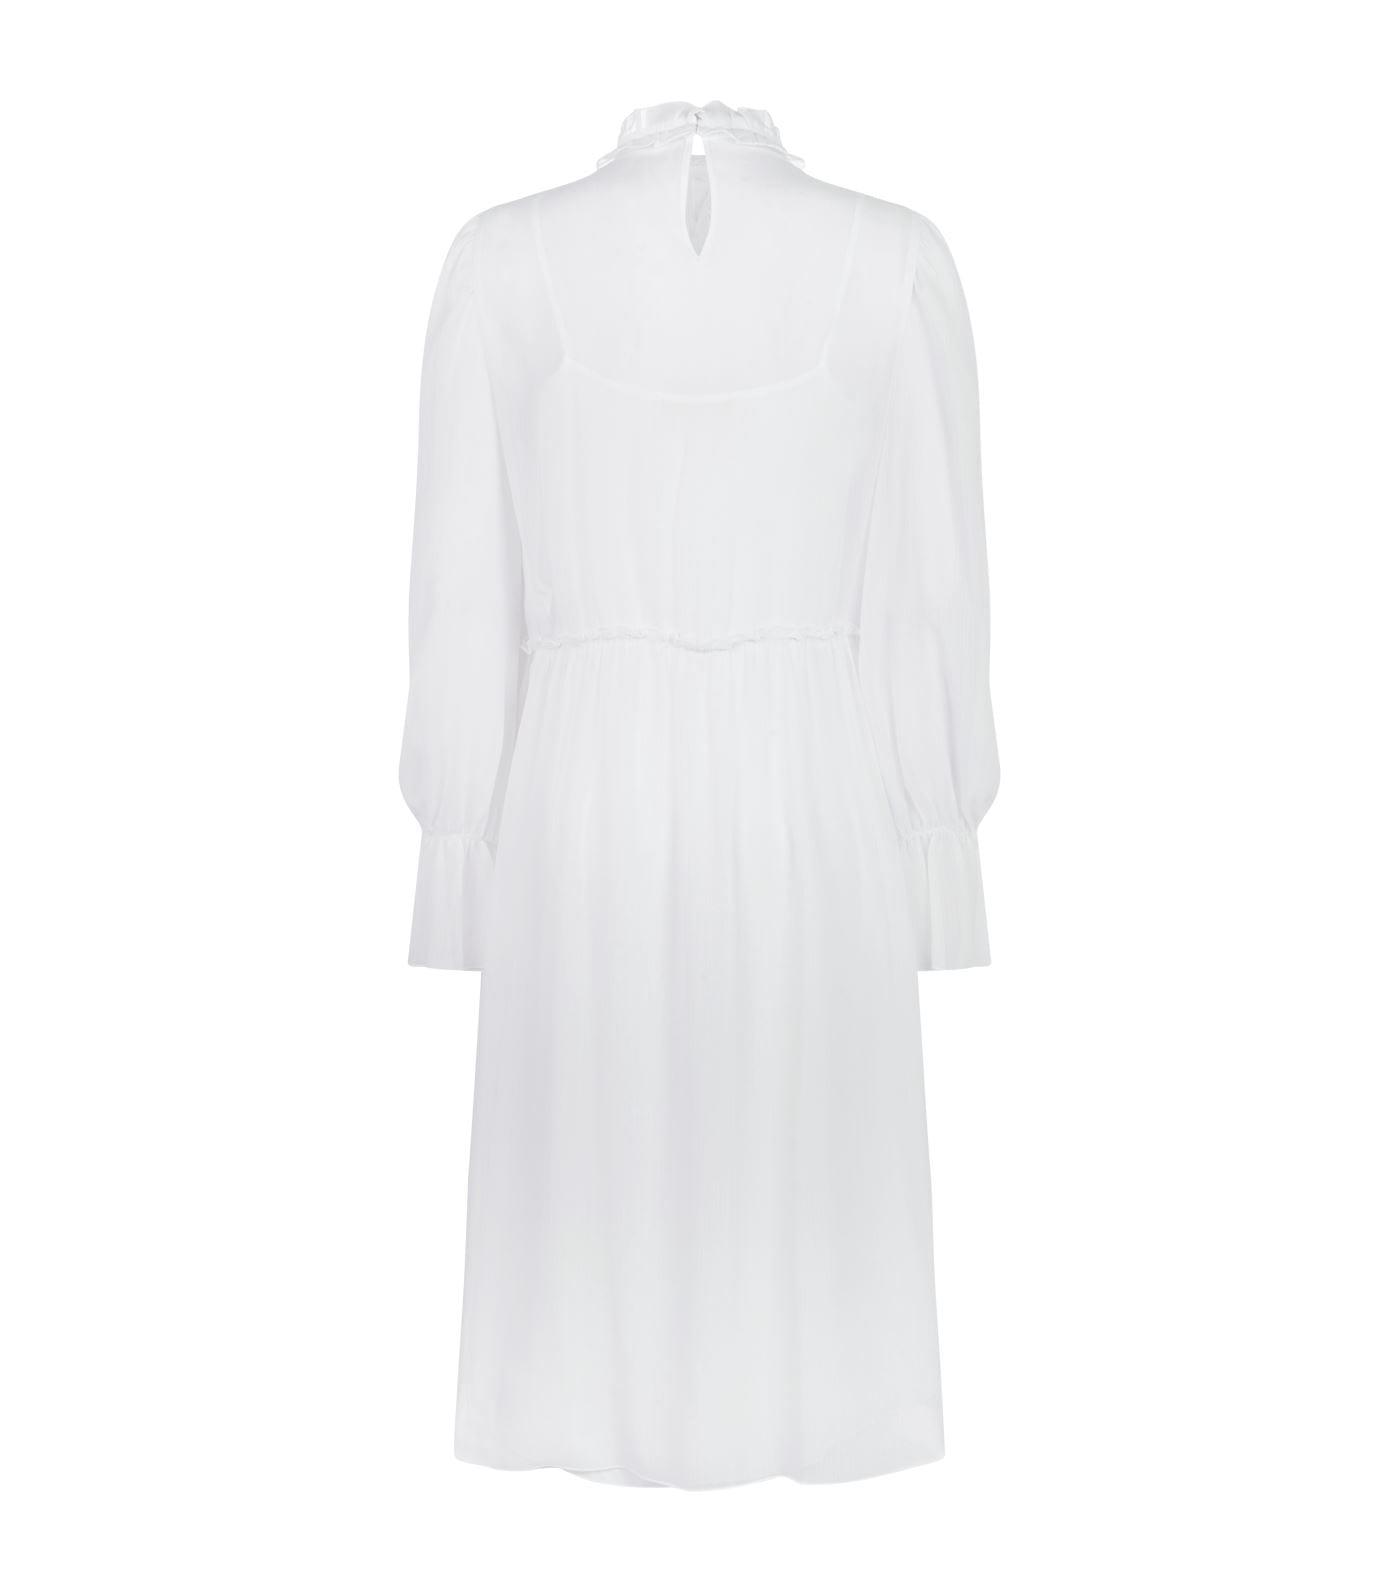 ce5f25b6a3 SEE BY CHLOÉ Embellished Ruffle Midi White Dress - We Select Dresses